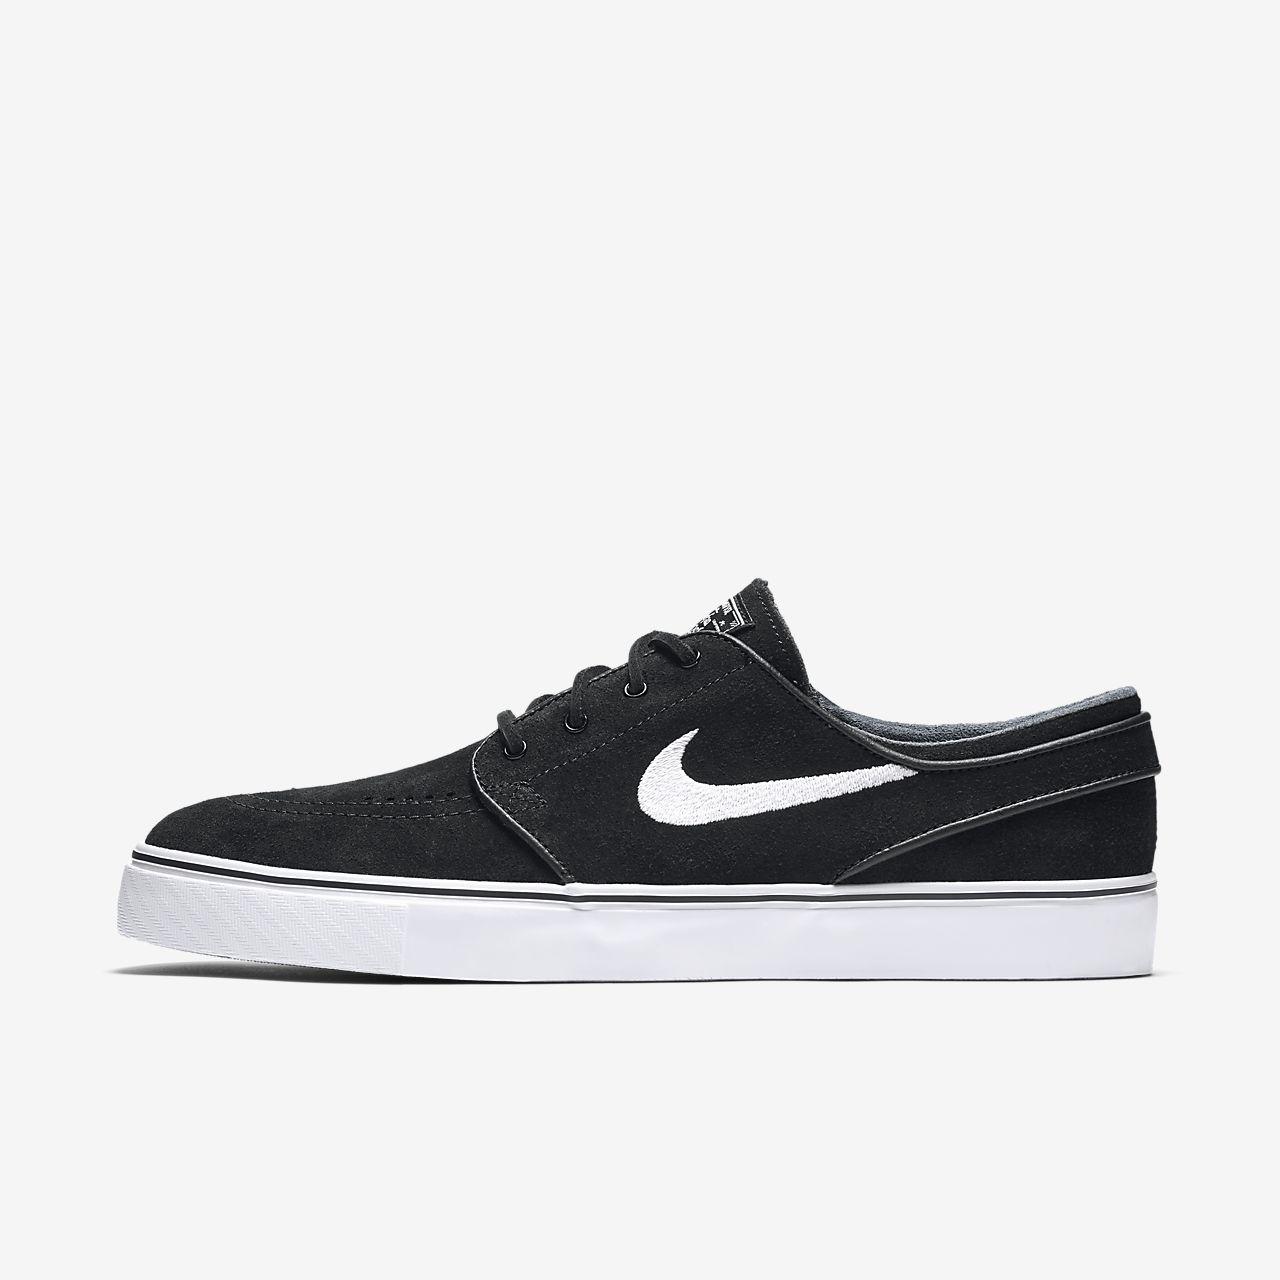 Janoski Stefan Nike OG Zoom Herren Skateboardschuh SB TlcF13JK